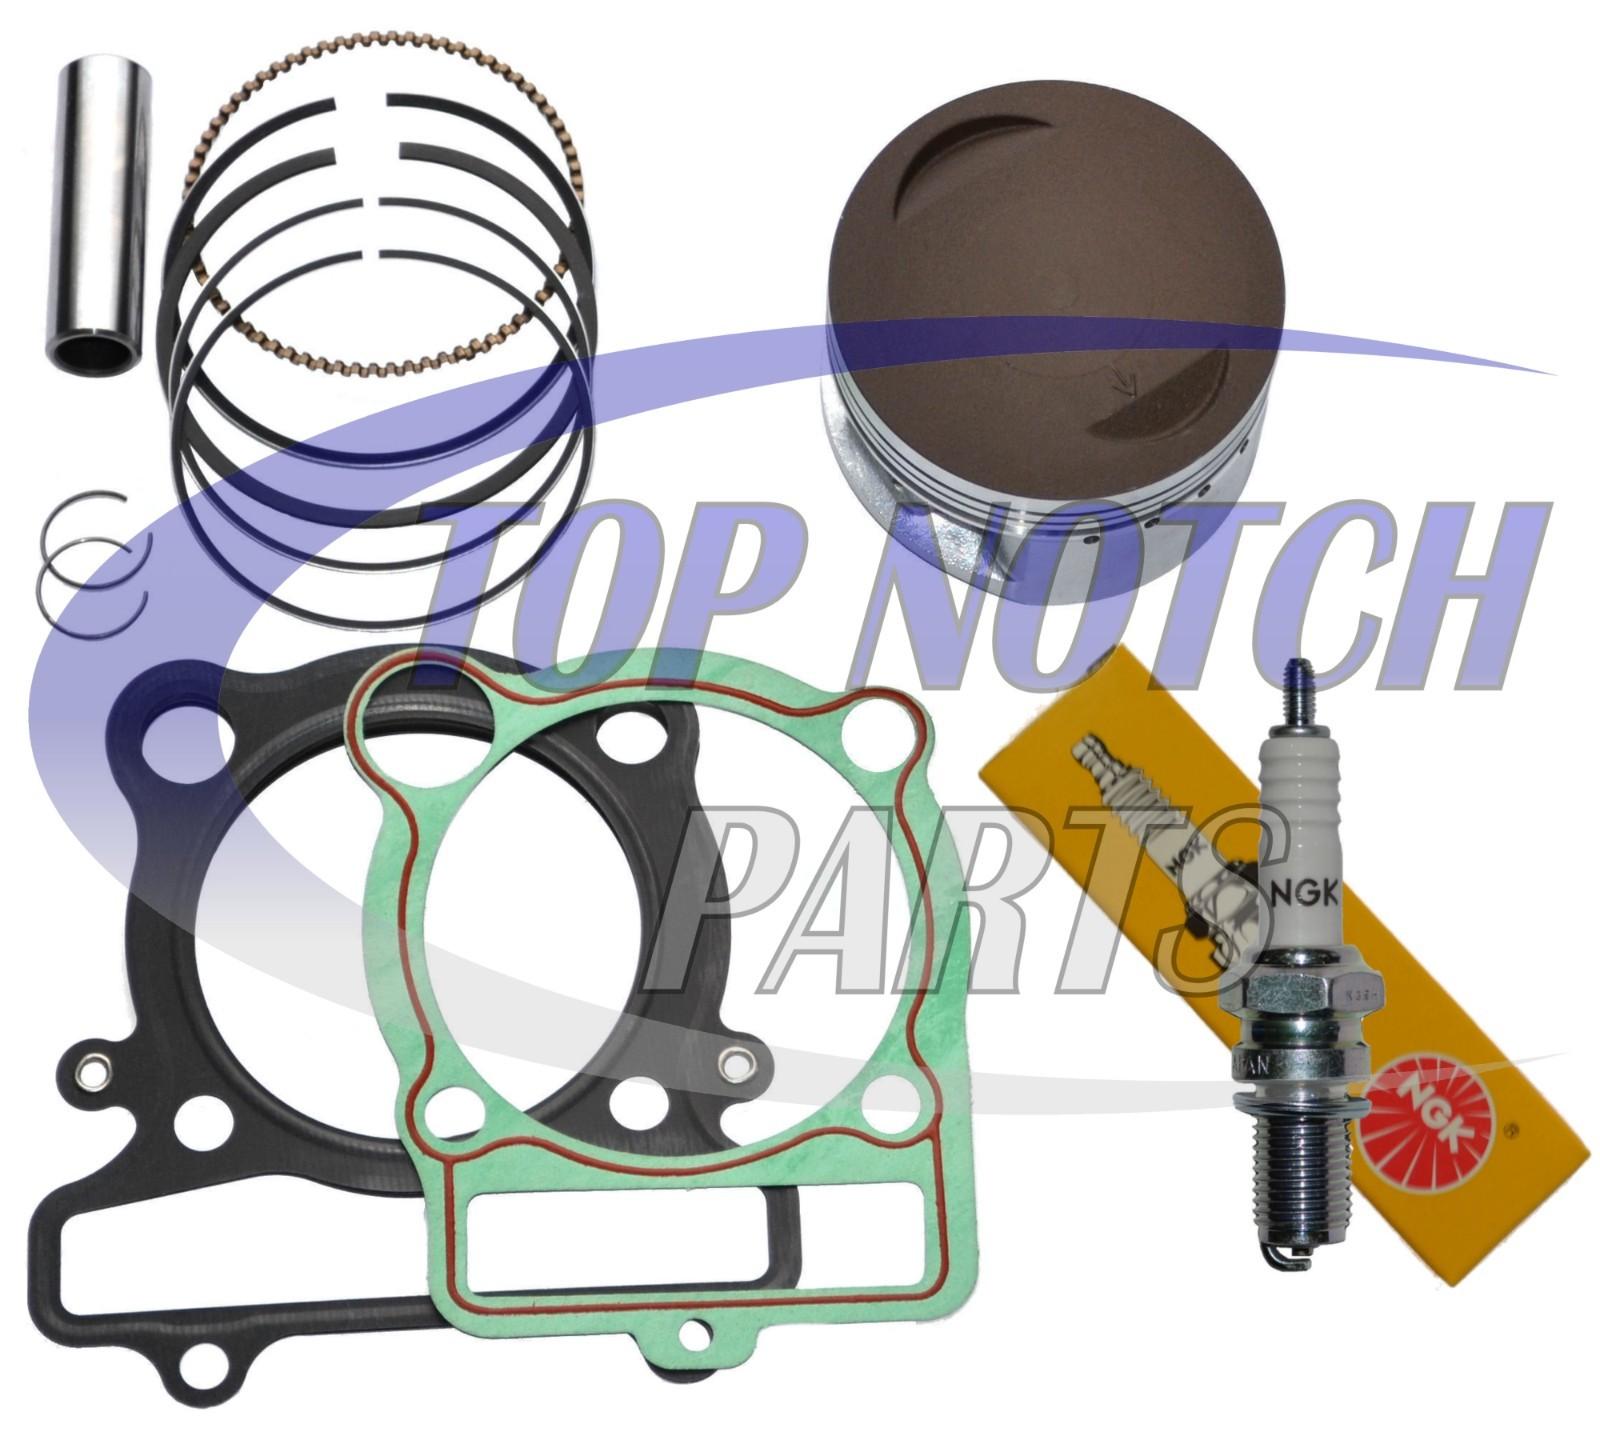 PISTON RINGS GASKET WITH SPARK PLUG KIT For YAMAHA WARRIOR 350 YFM 350 87-04